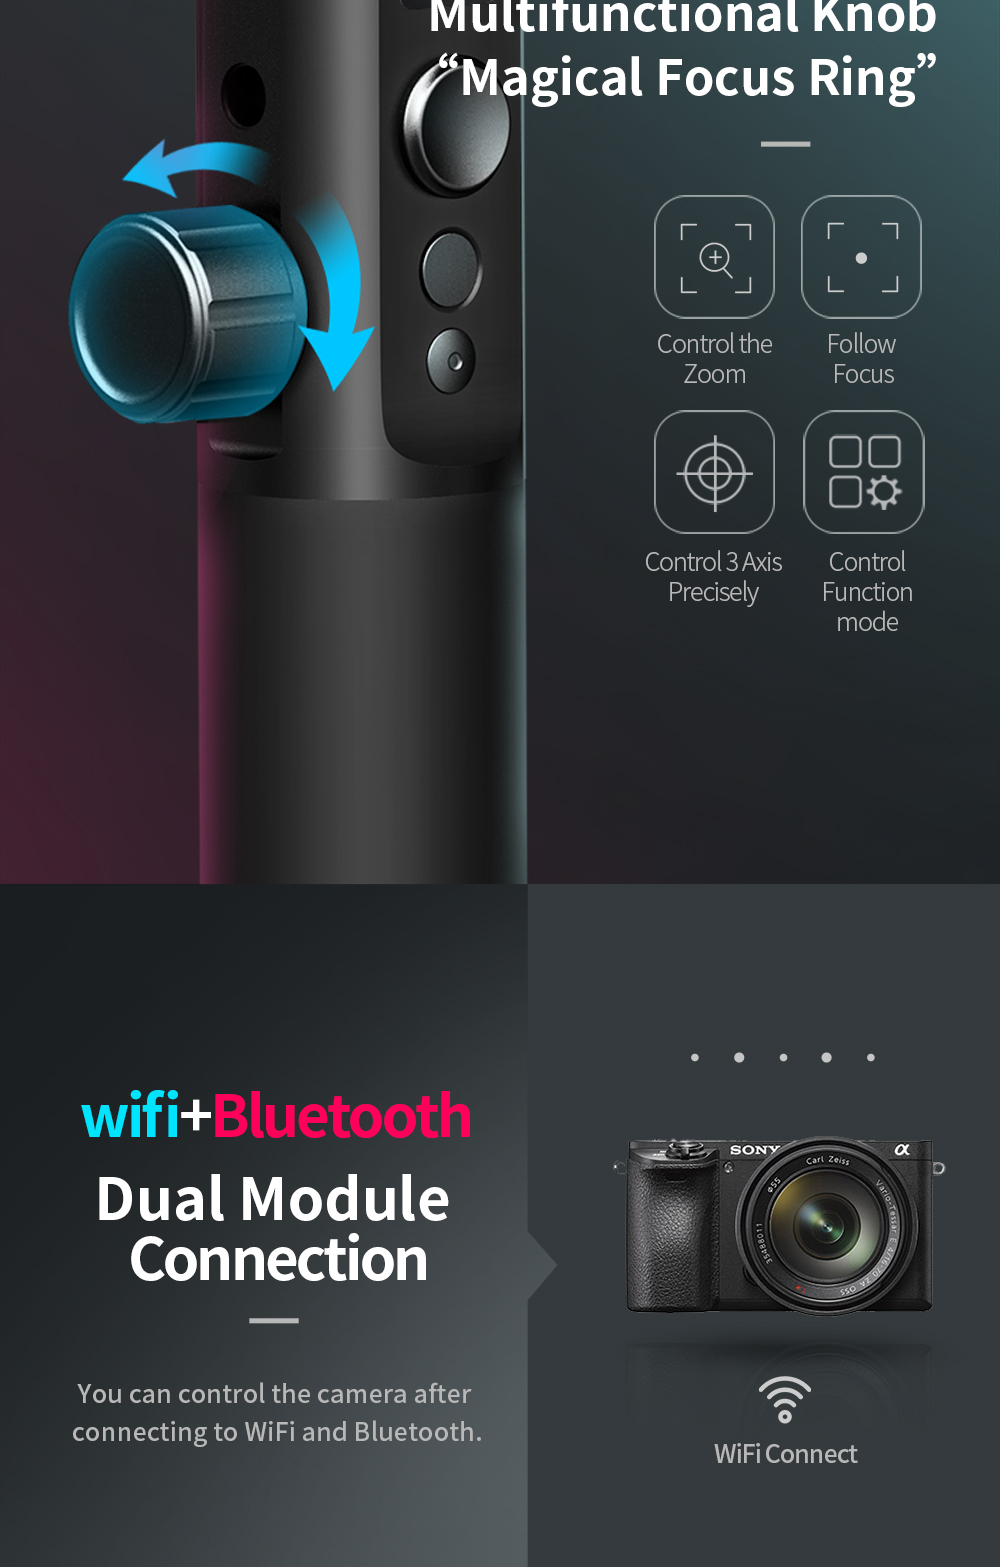 FeiyuTech G6 Plus 3-Axis Handheld Gimbal Stabilizer for Mirrorless Camera Pocket Camera GoPro Smartphone Payload 800g Feiyu G6P 4